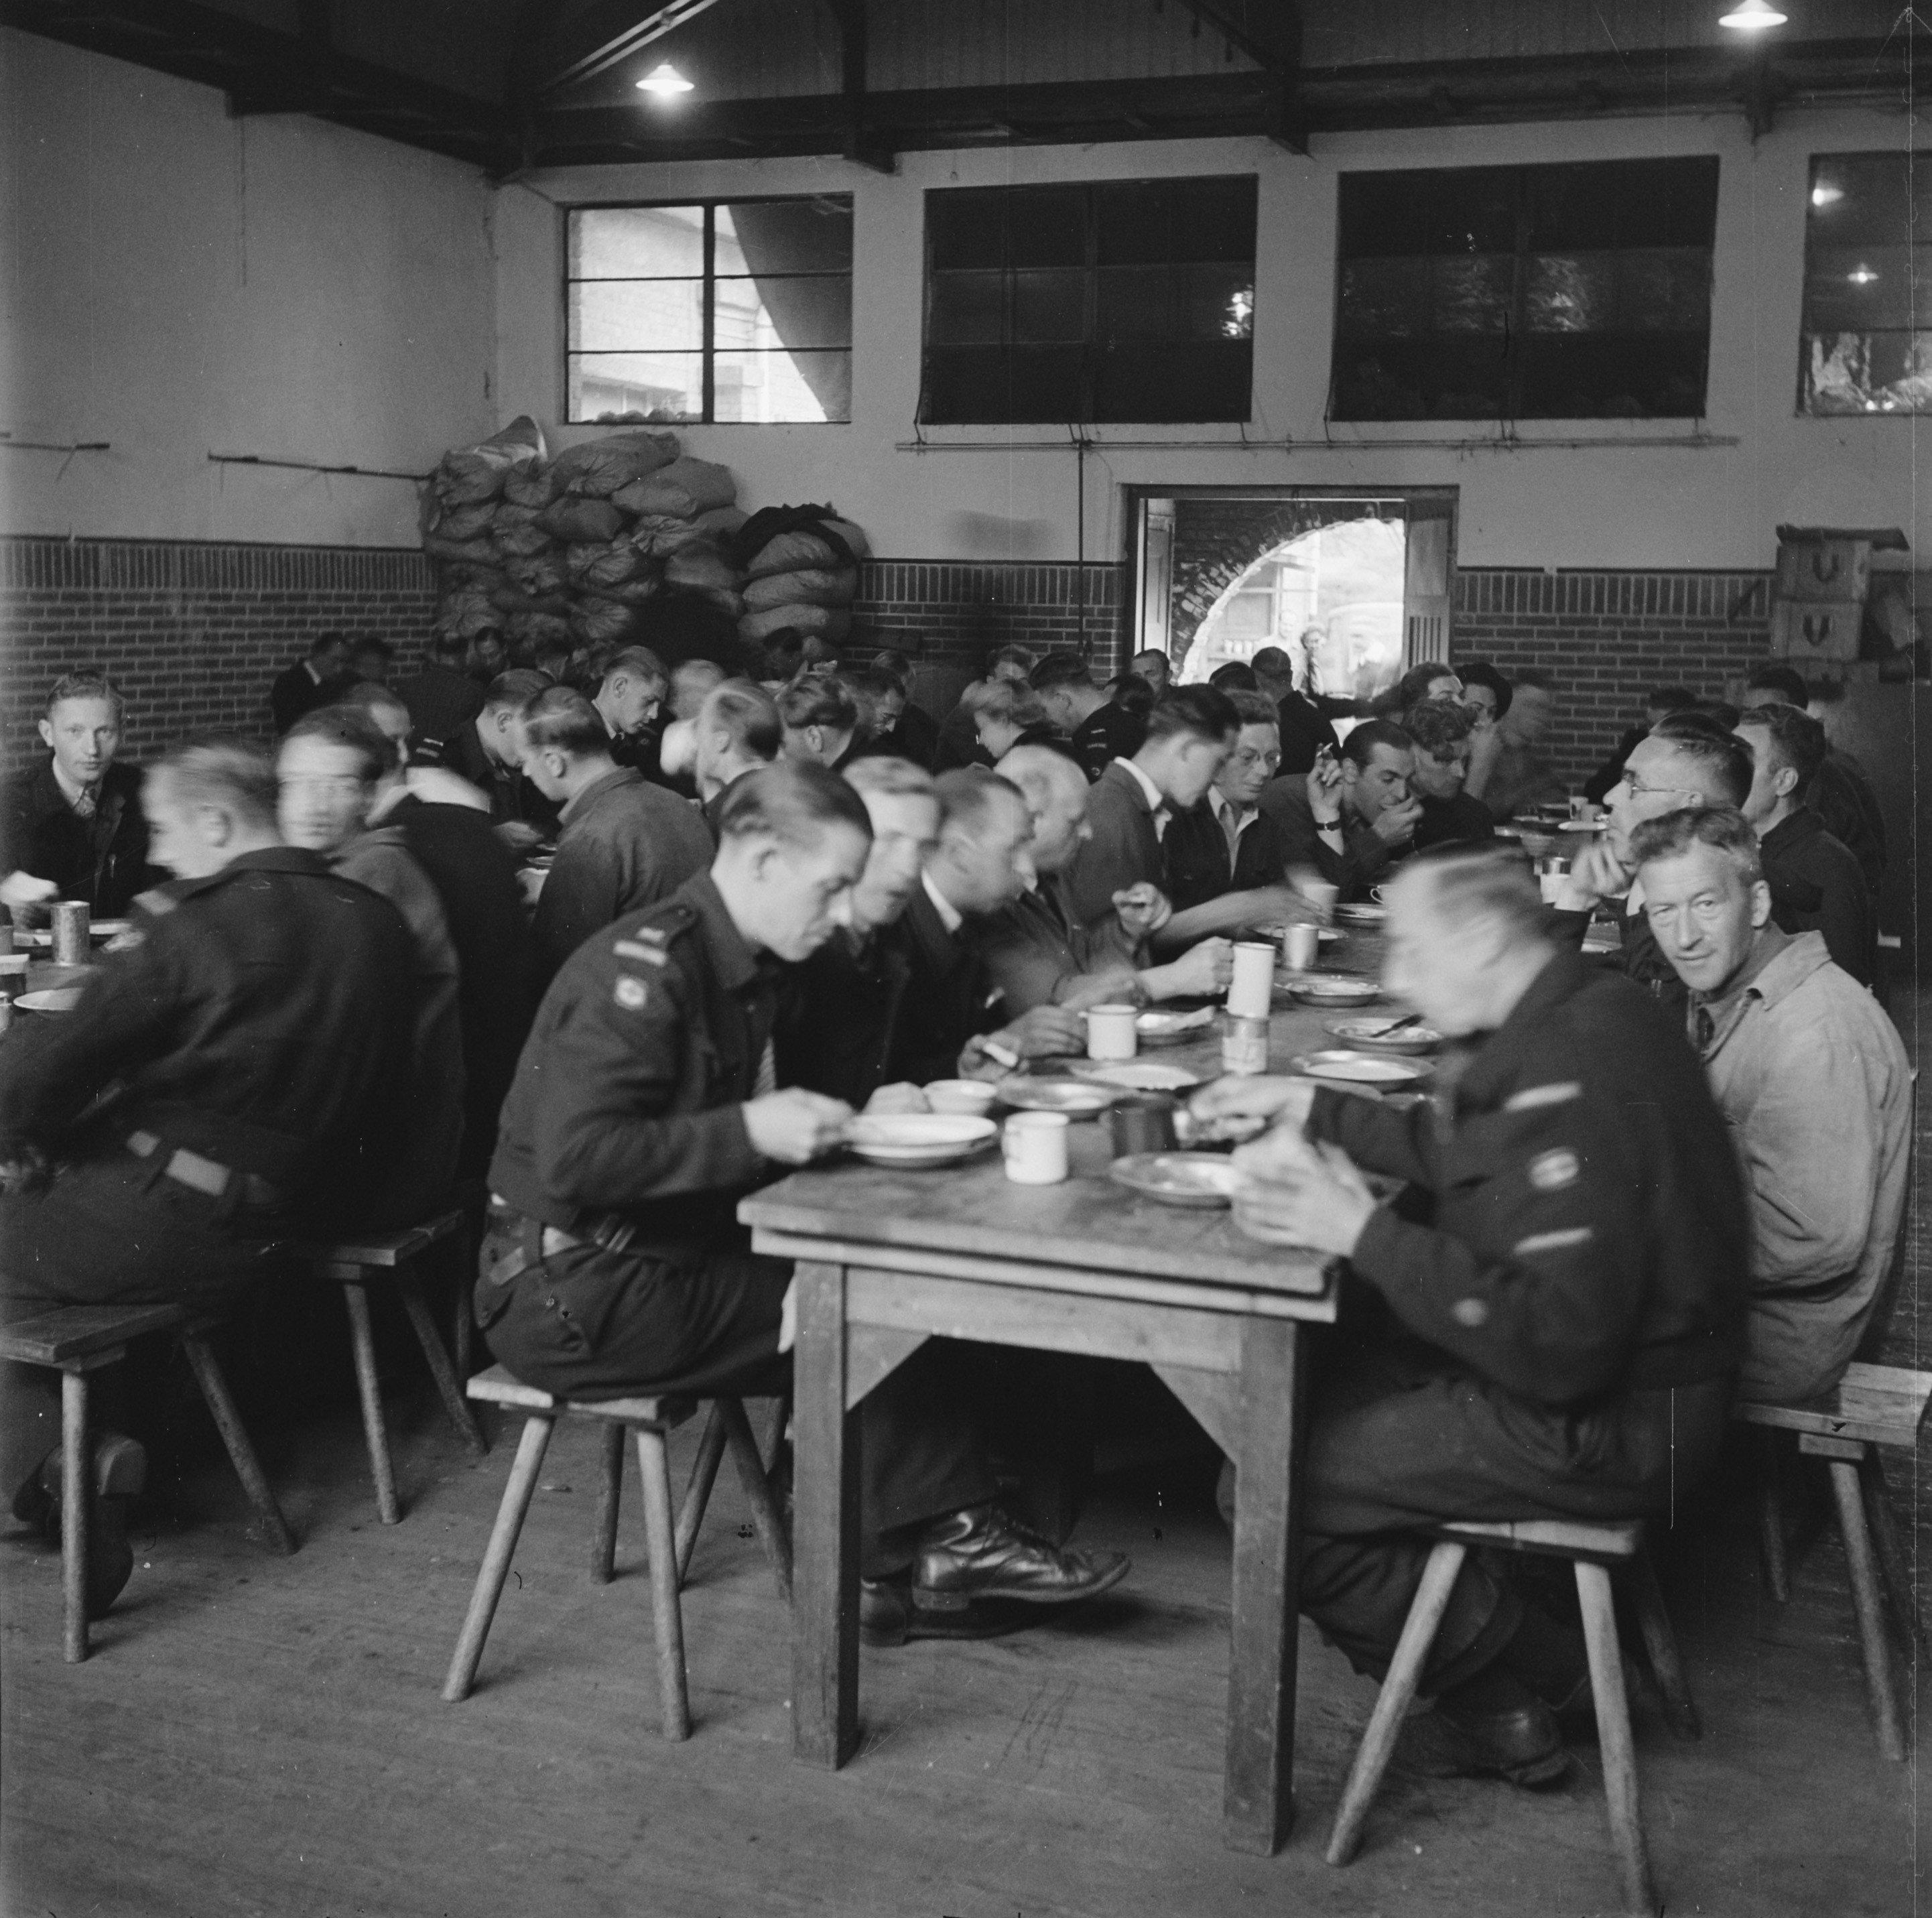 File:Hoofdkwartier Rode Kruis te Alphen aan den Rijn, Bestanddeelnr  900-4860.